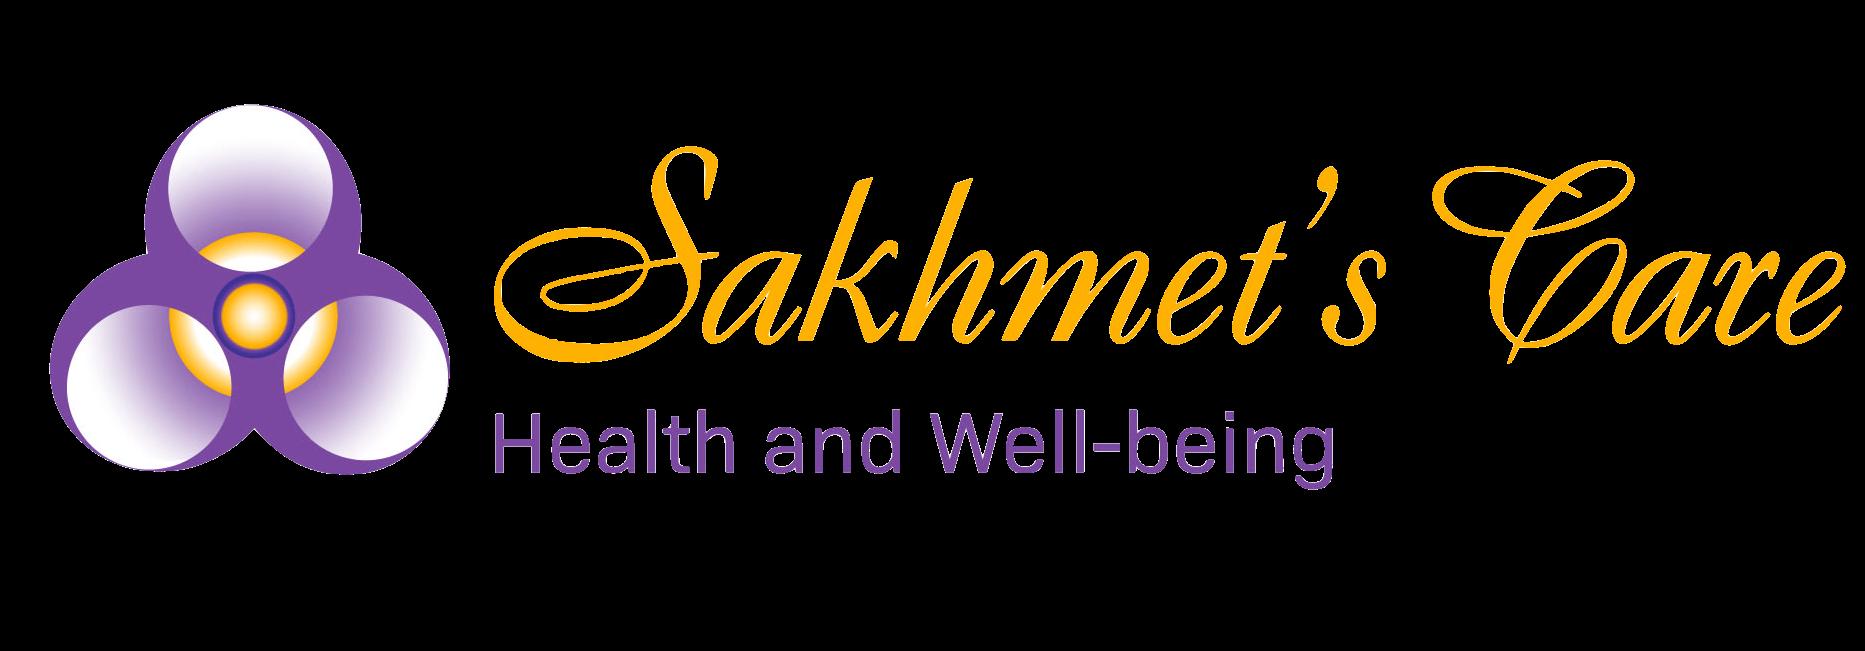 Sakhmet's Care